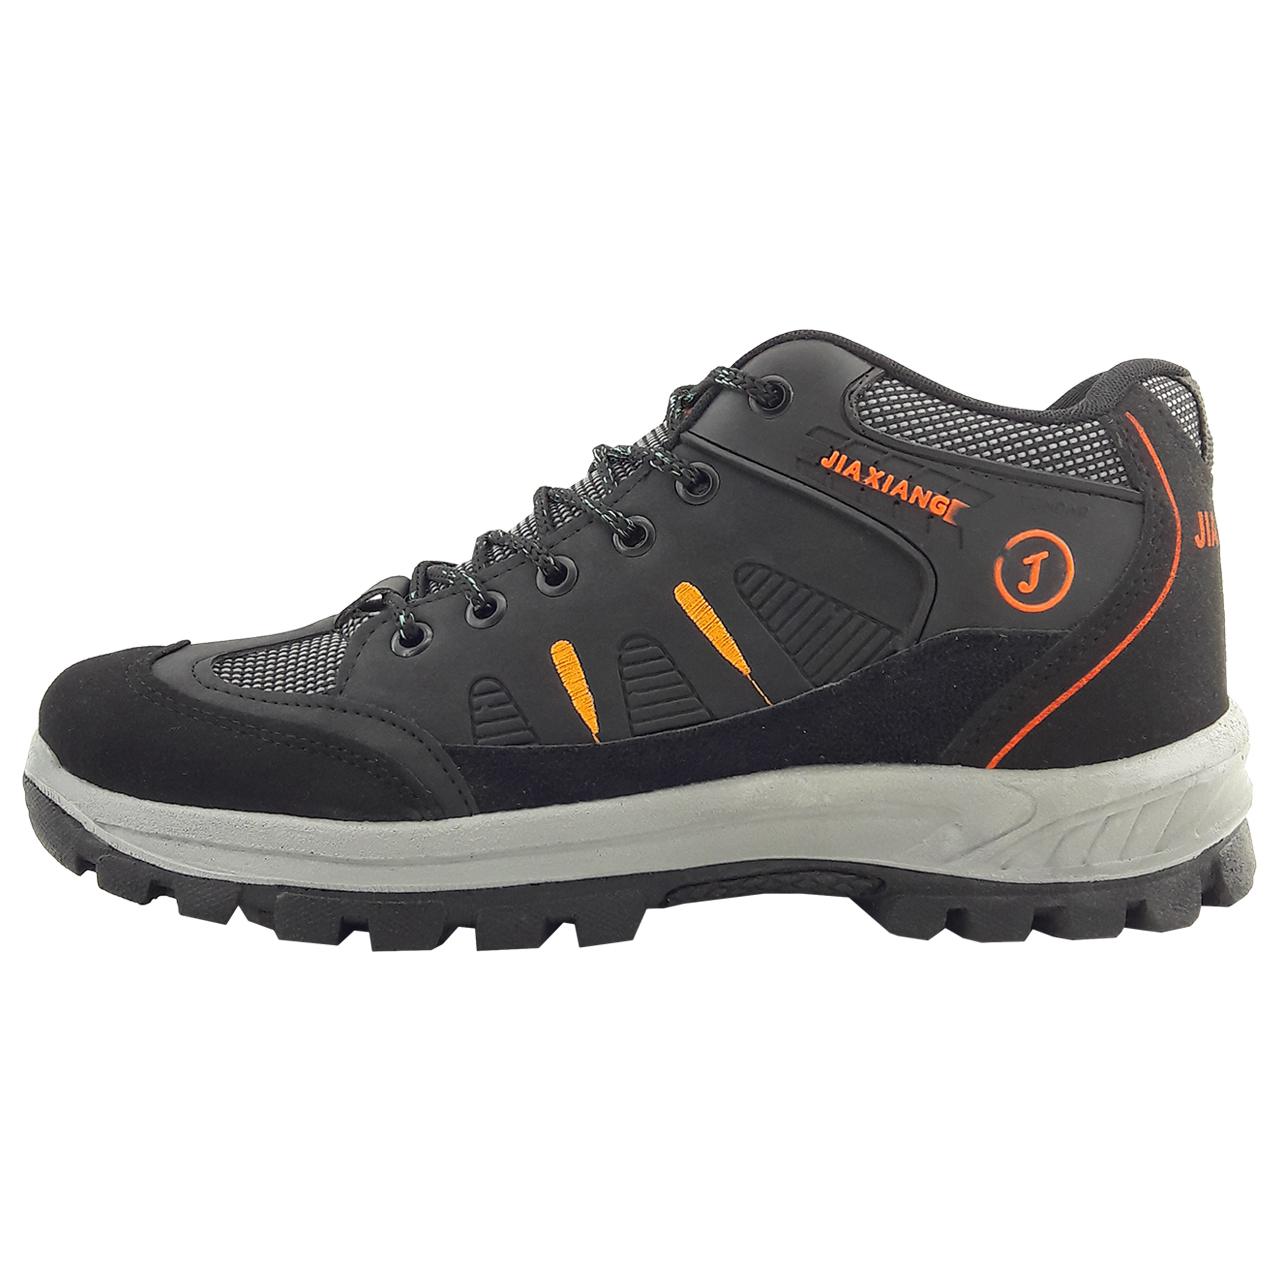 قیمت کفش کوهنوردی مردانه جیاکسیانگ مدل Jx.tnd.bl org-01